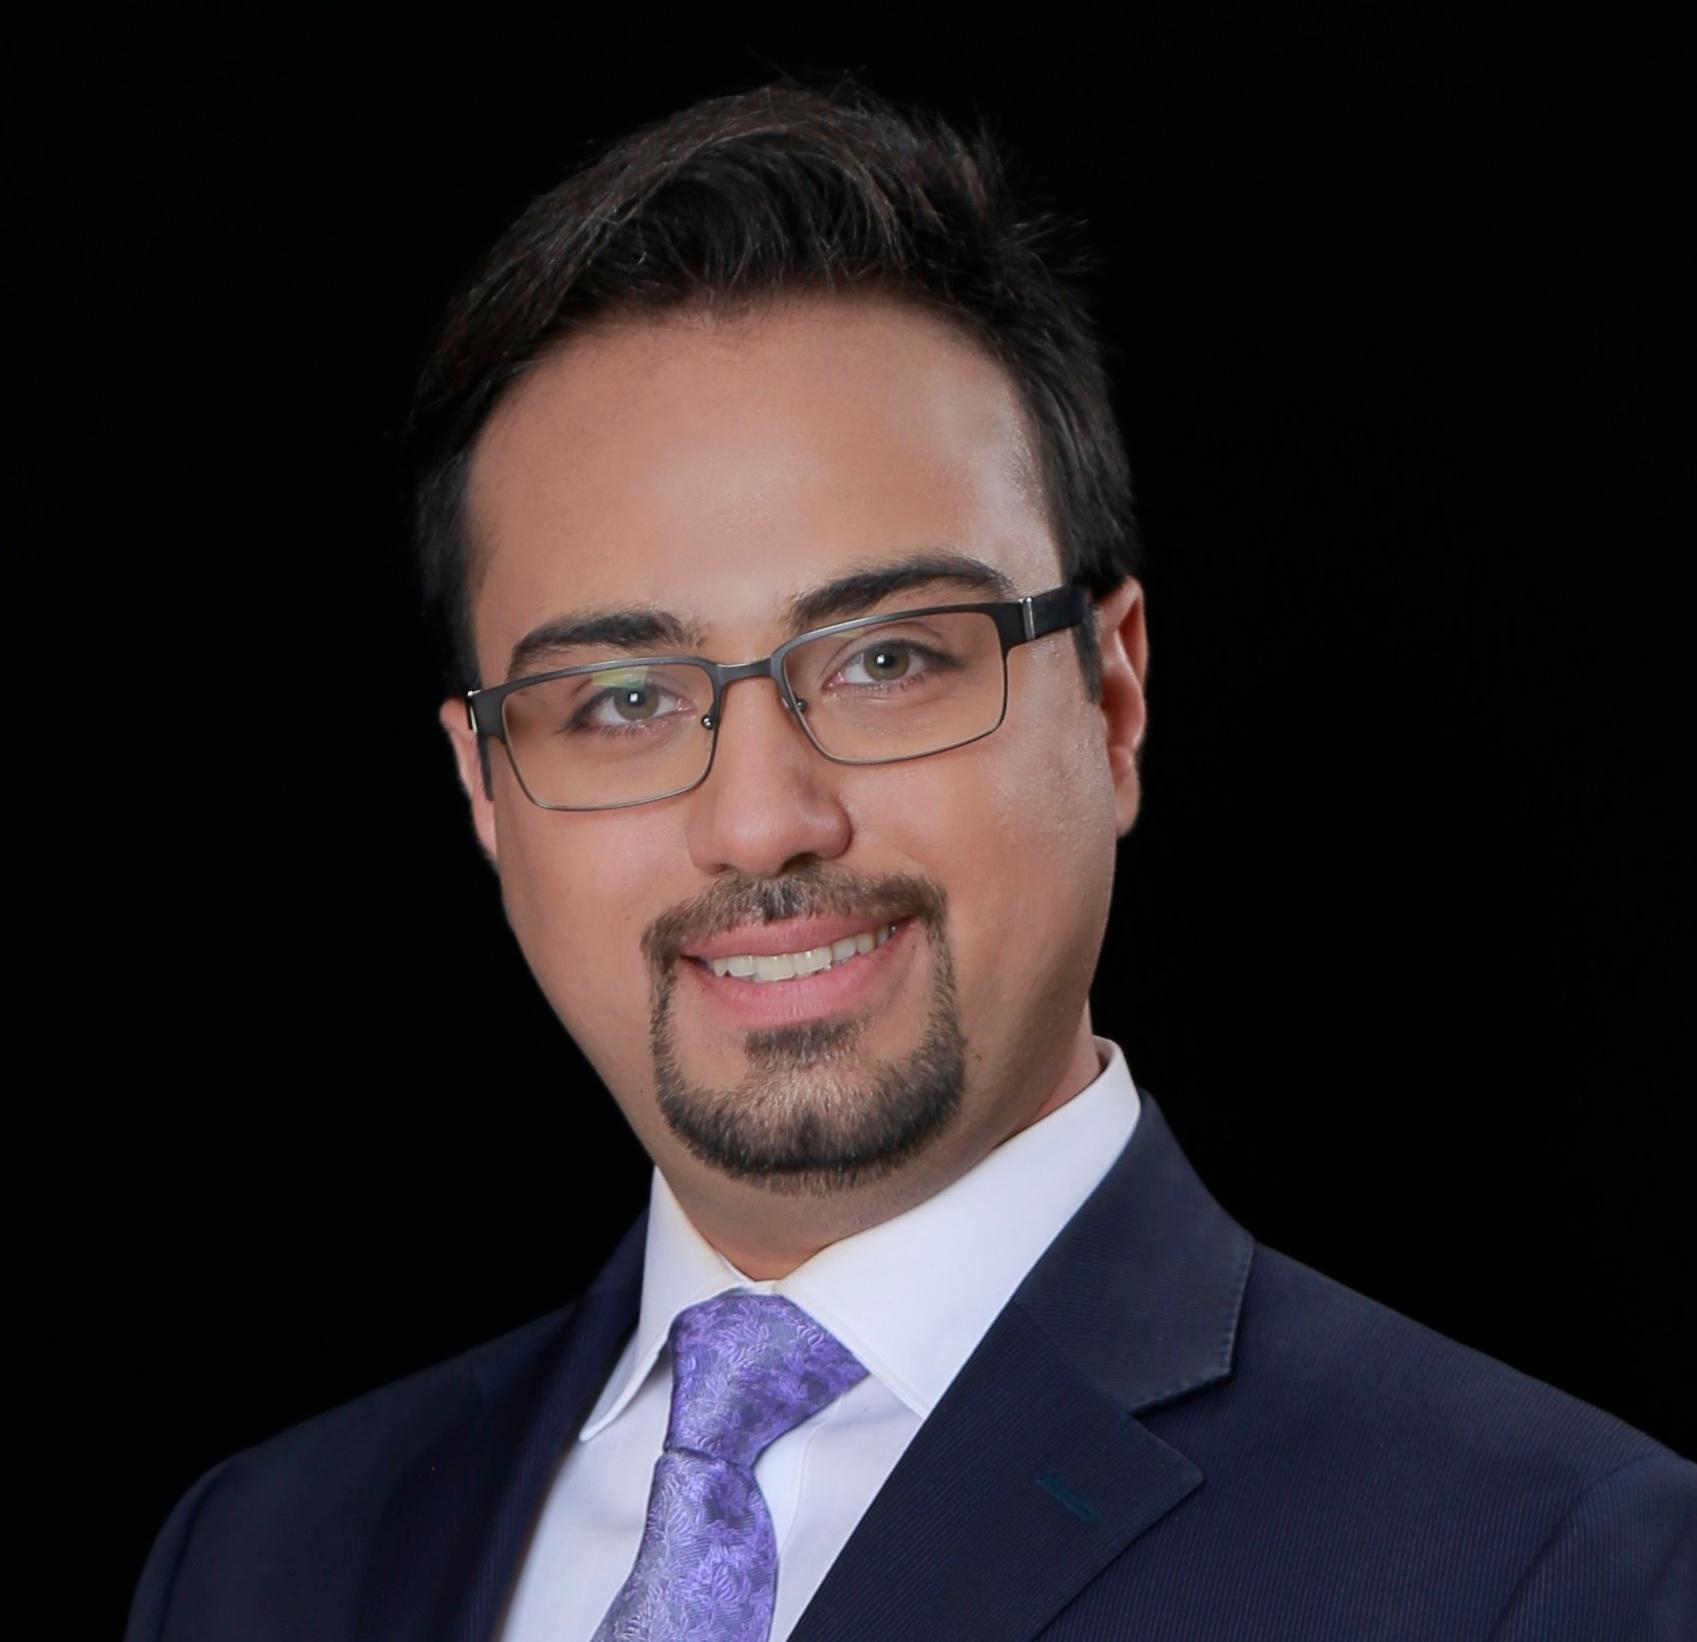 Mr. Amir Derayatifar, Head of the Mathematics Department